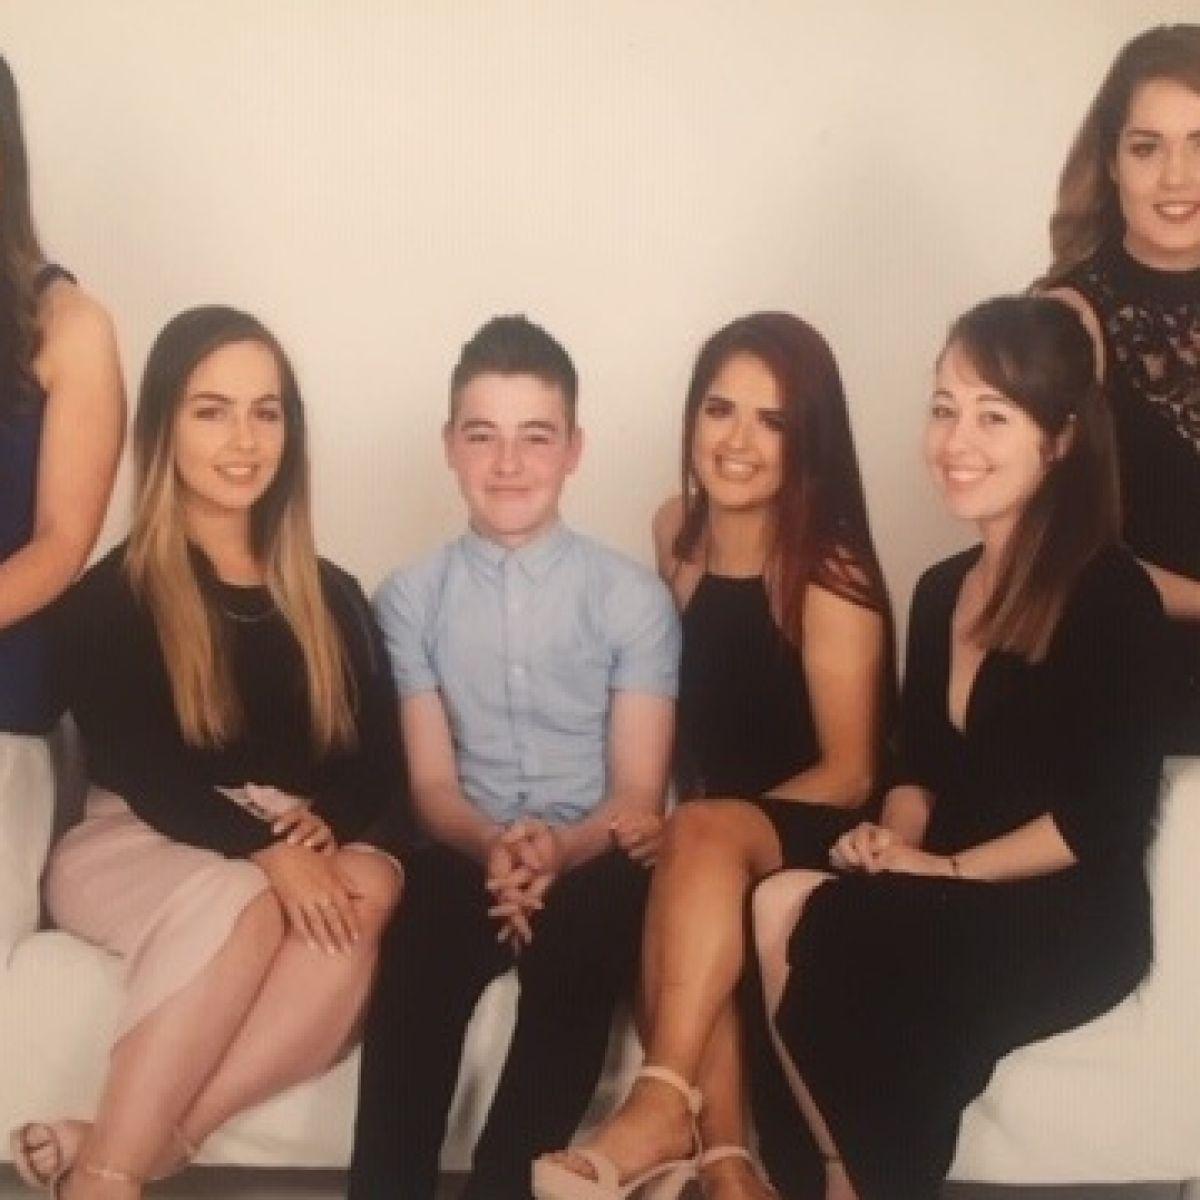 Teen Nights at Toffs Nightclub, Sligo - Posts   Facebook